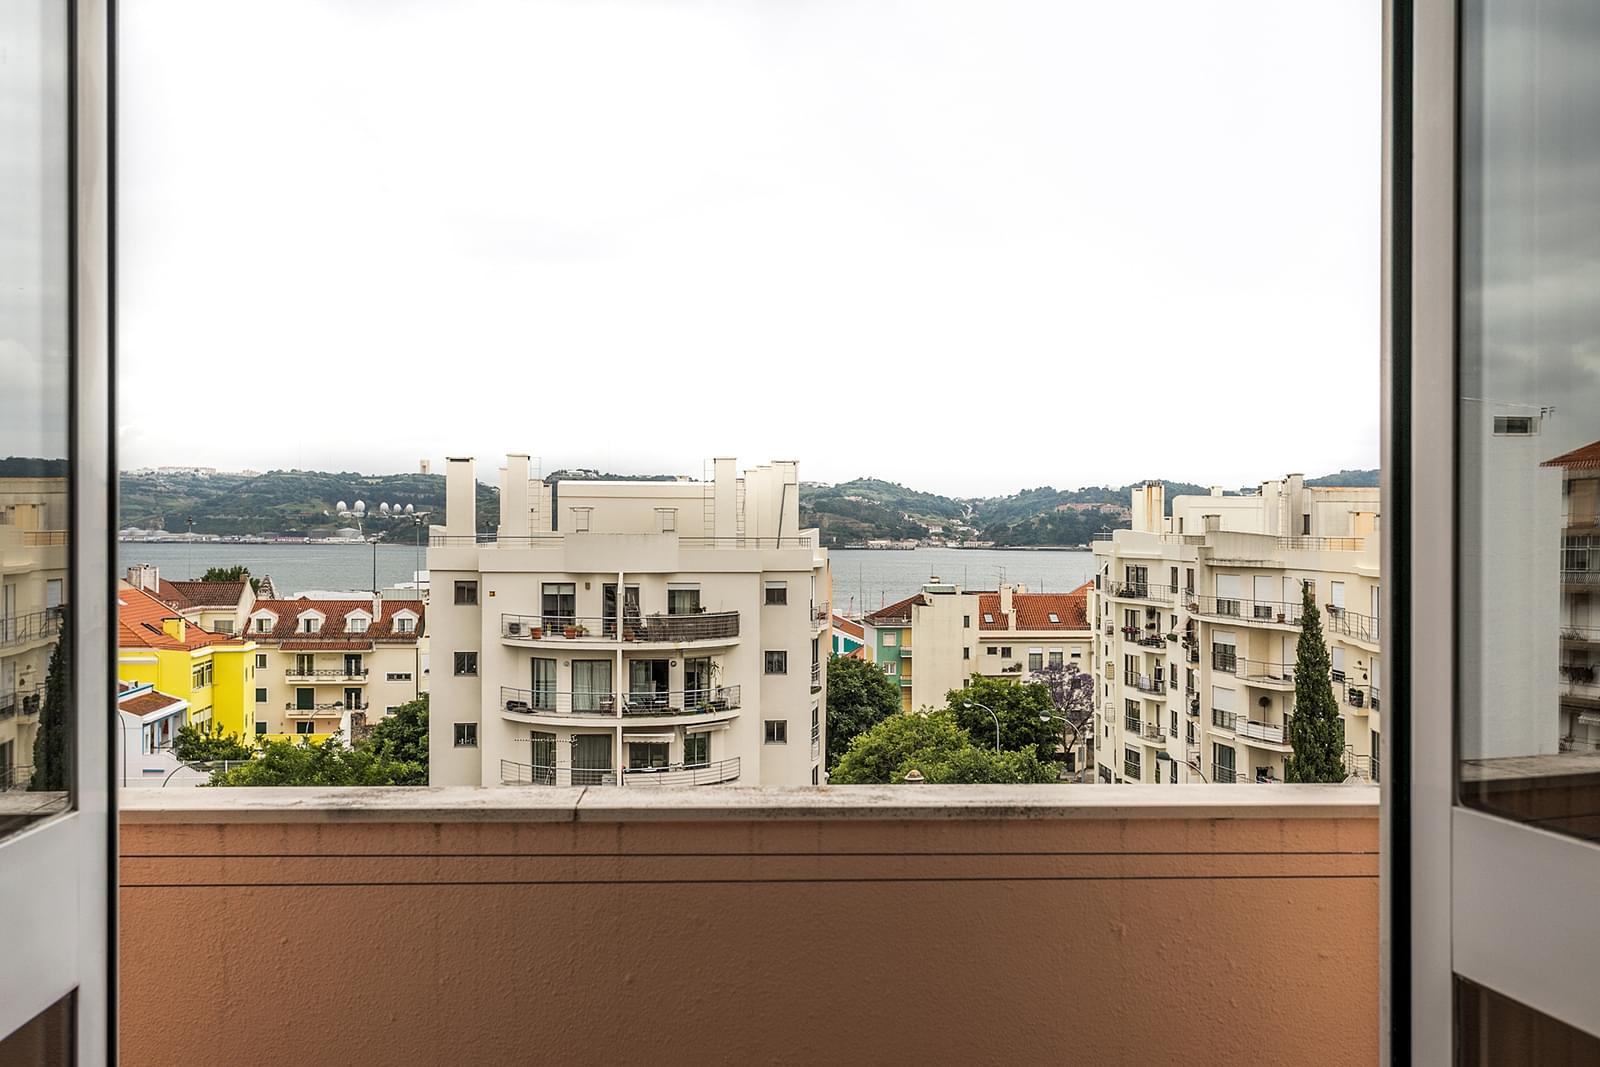 pf17352-apartamento-t3-lisboa-52af327c-cd16-4880-ac9c-6053ba6c84e2